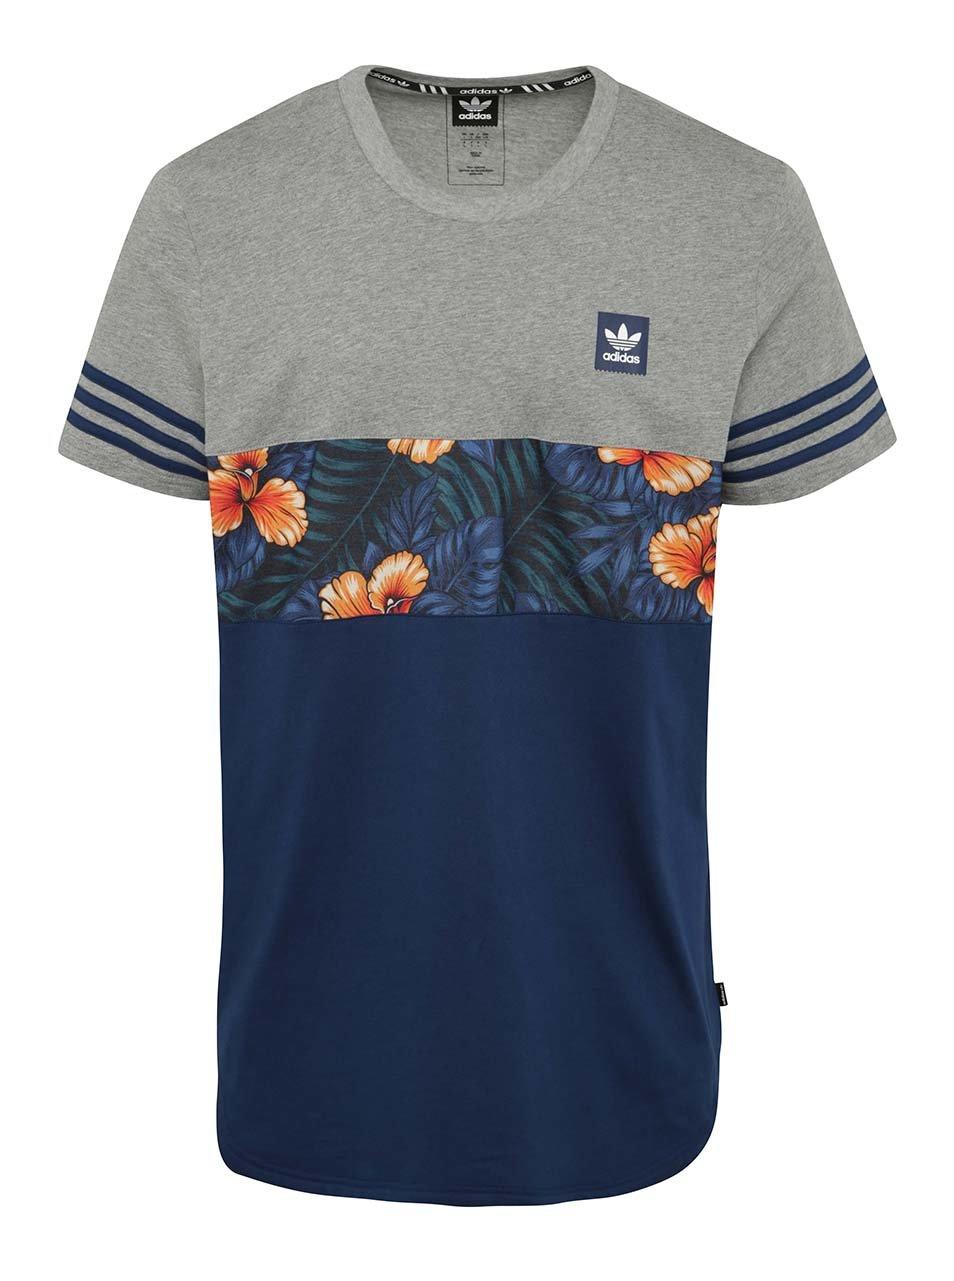 Šedo-modré pánské tričko s krátkým rukávem adidas Originals